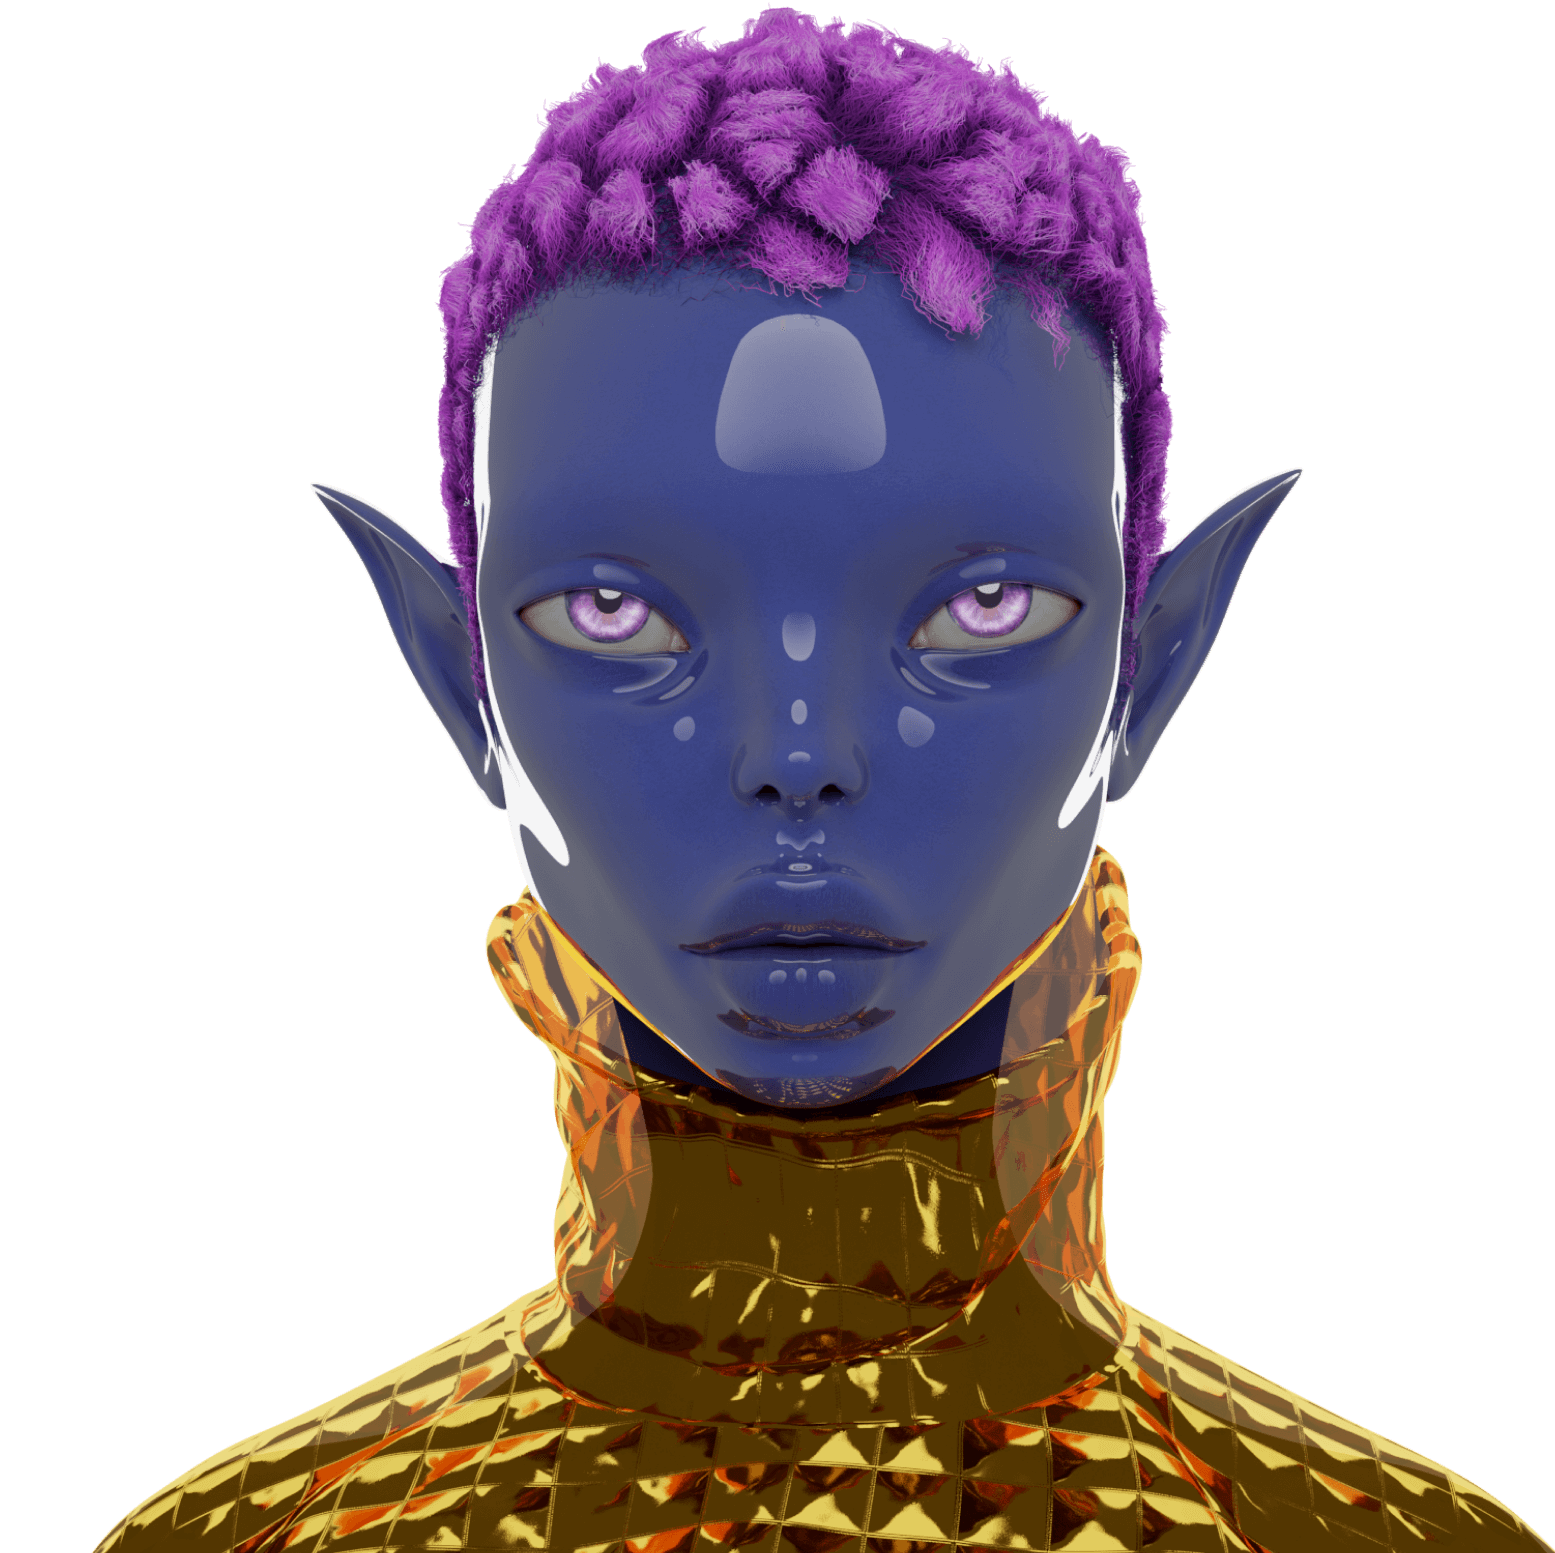 Virtual character face